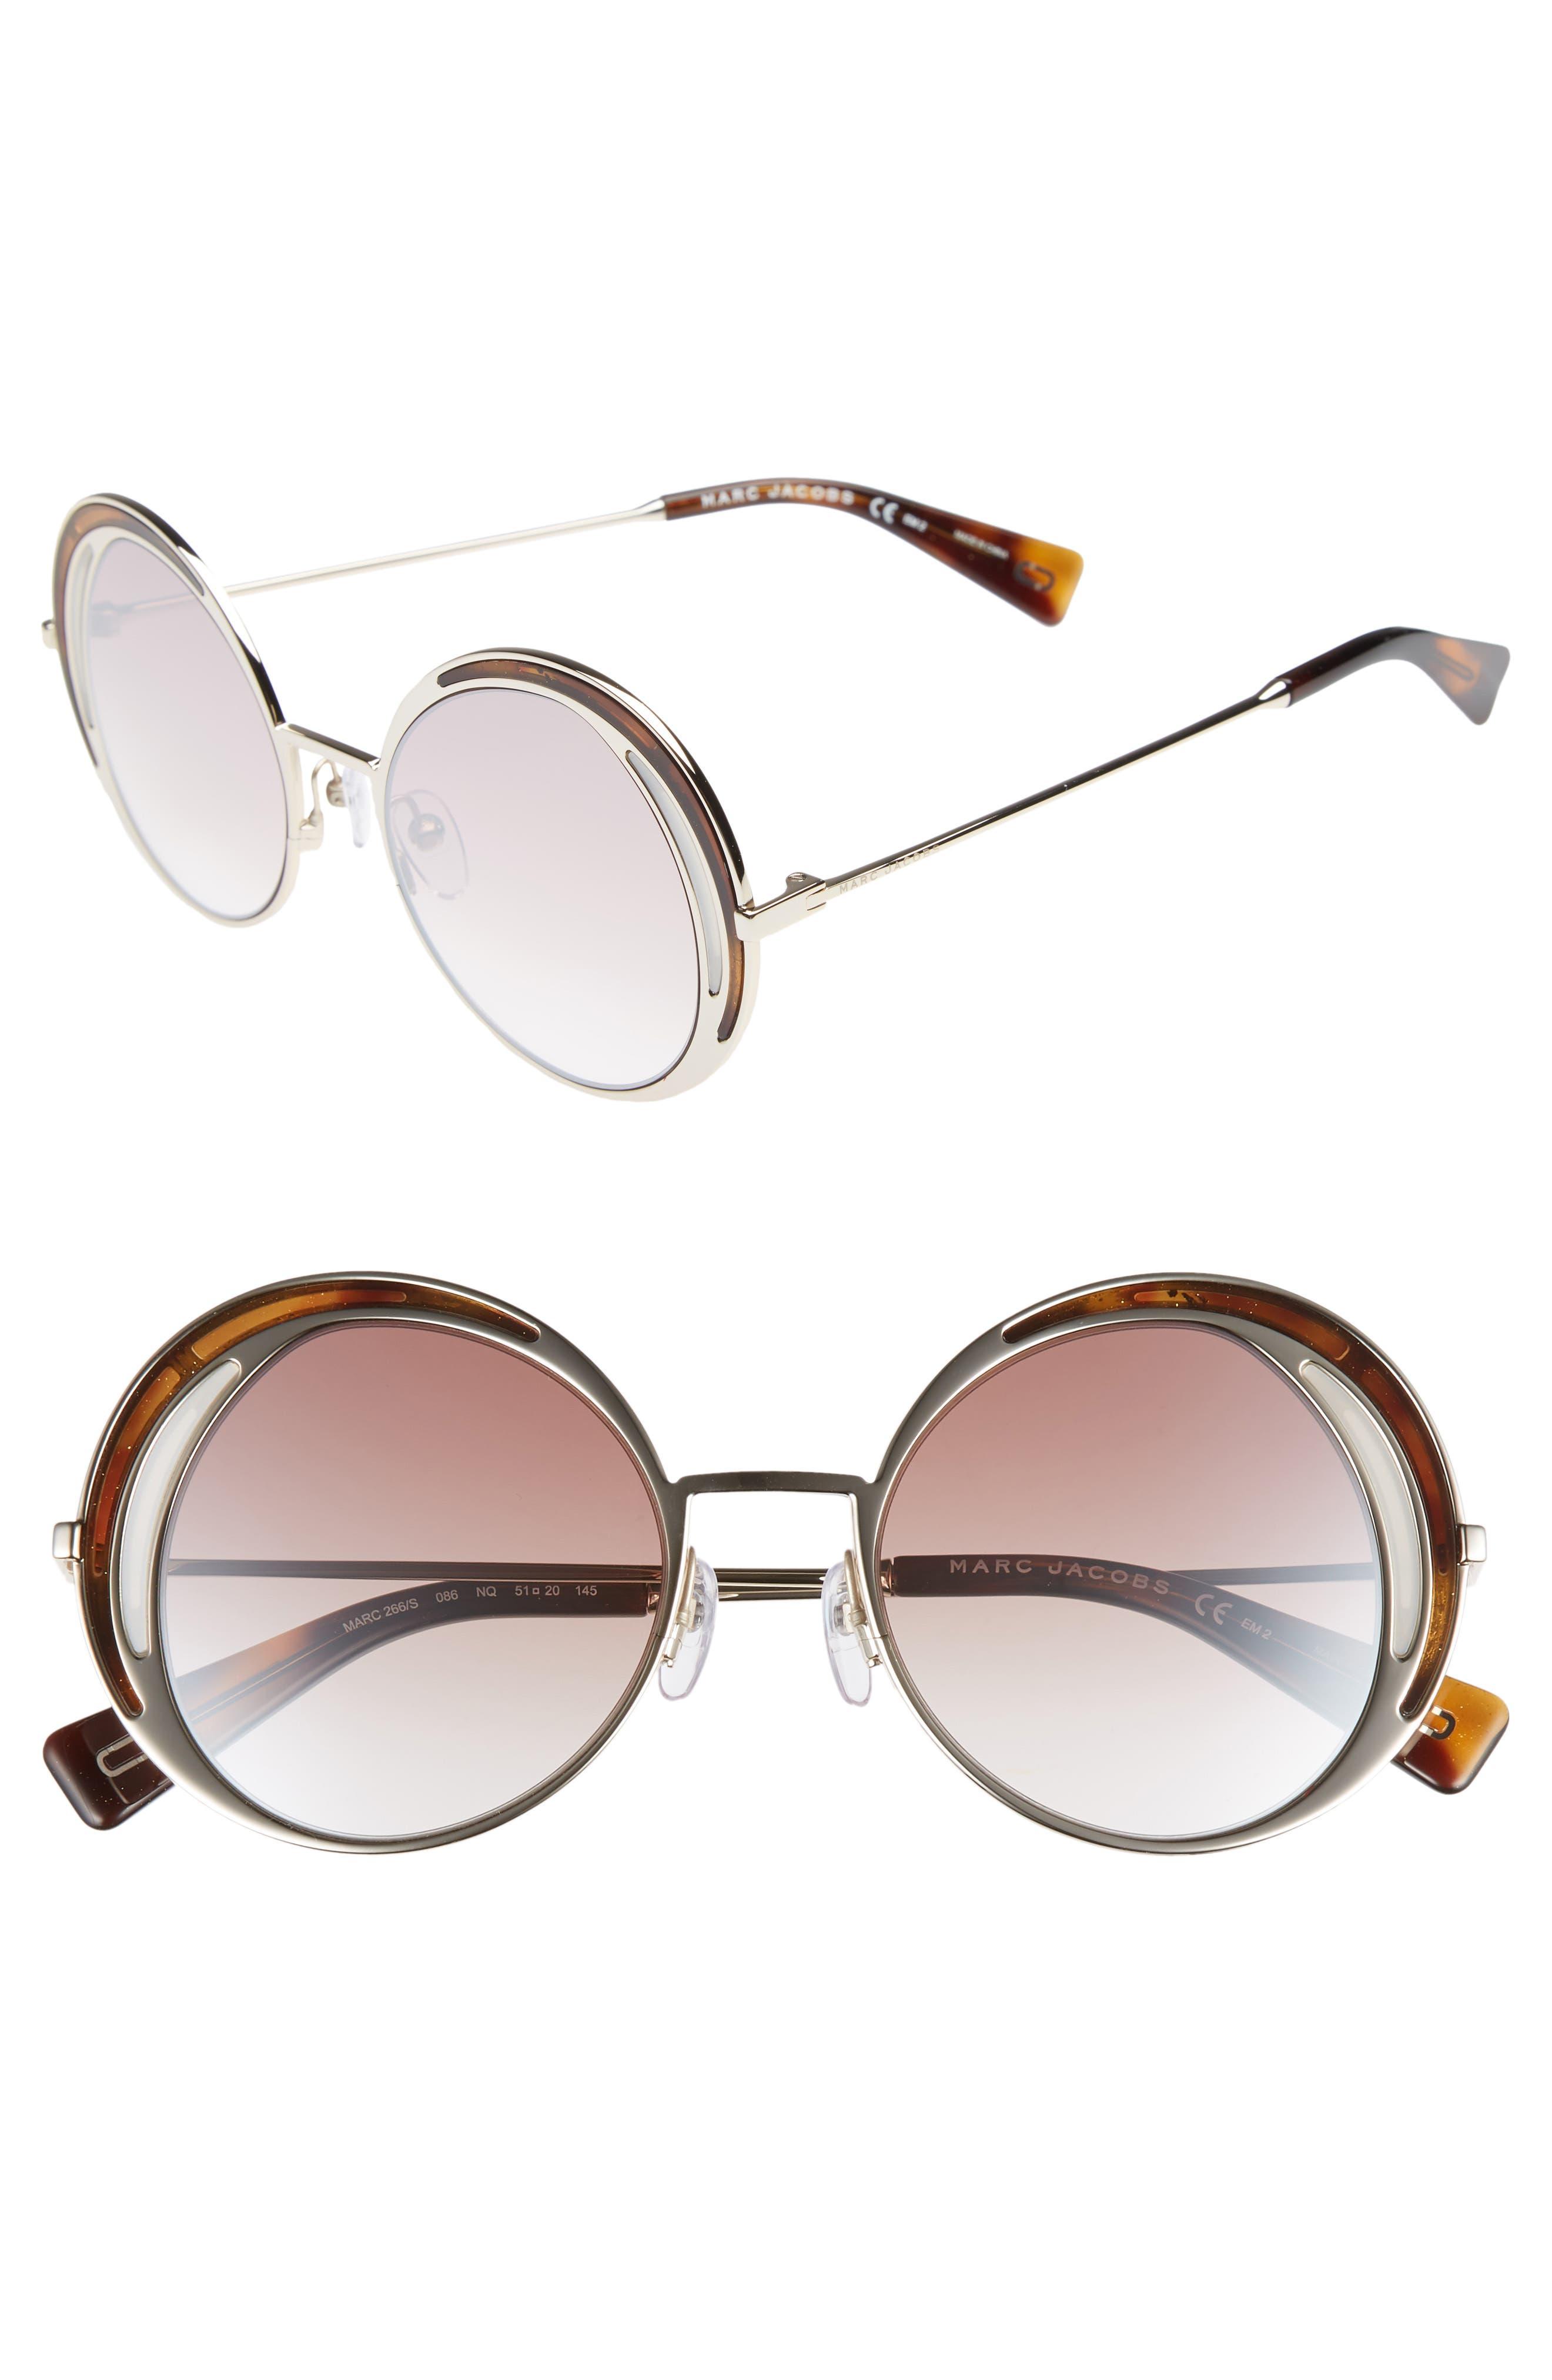 MARC JACOBS 51mm Round Sunglasses, Main, color, DARK HAVANA/ GOLD